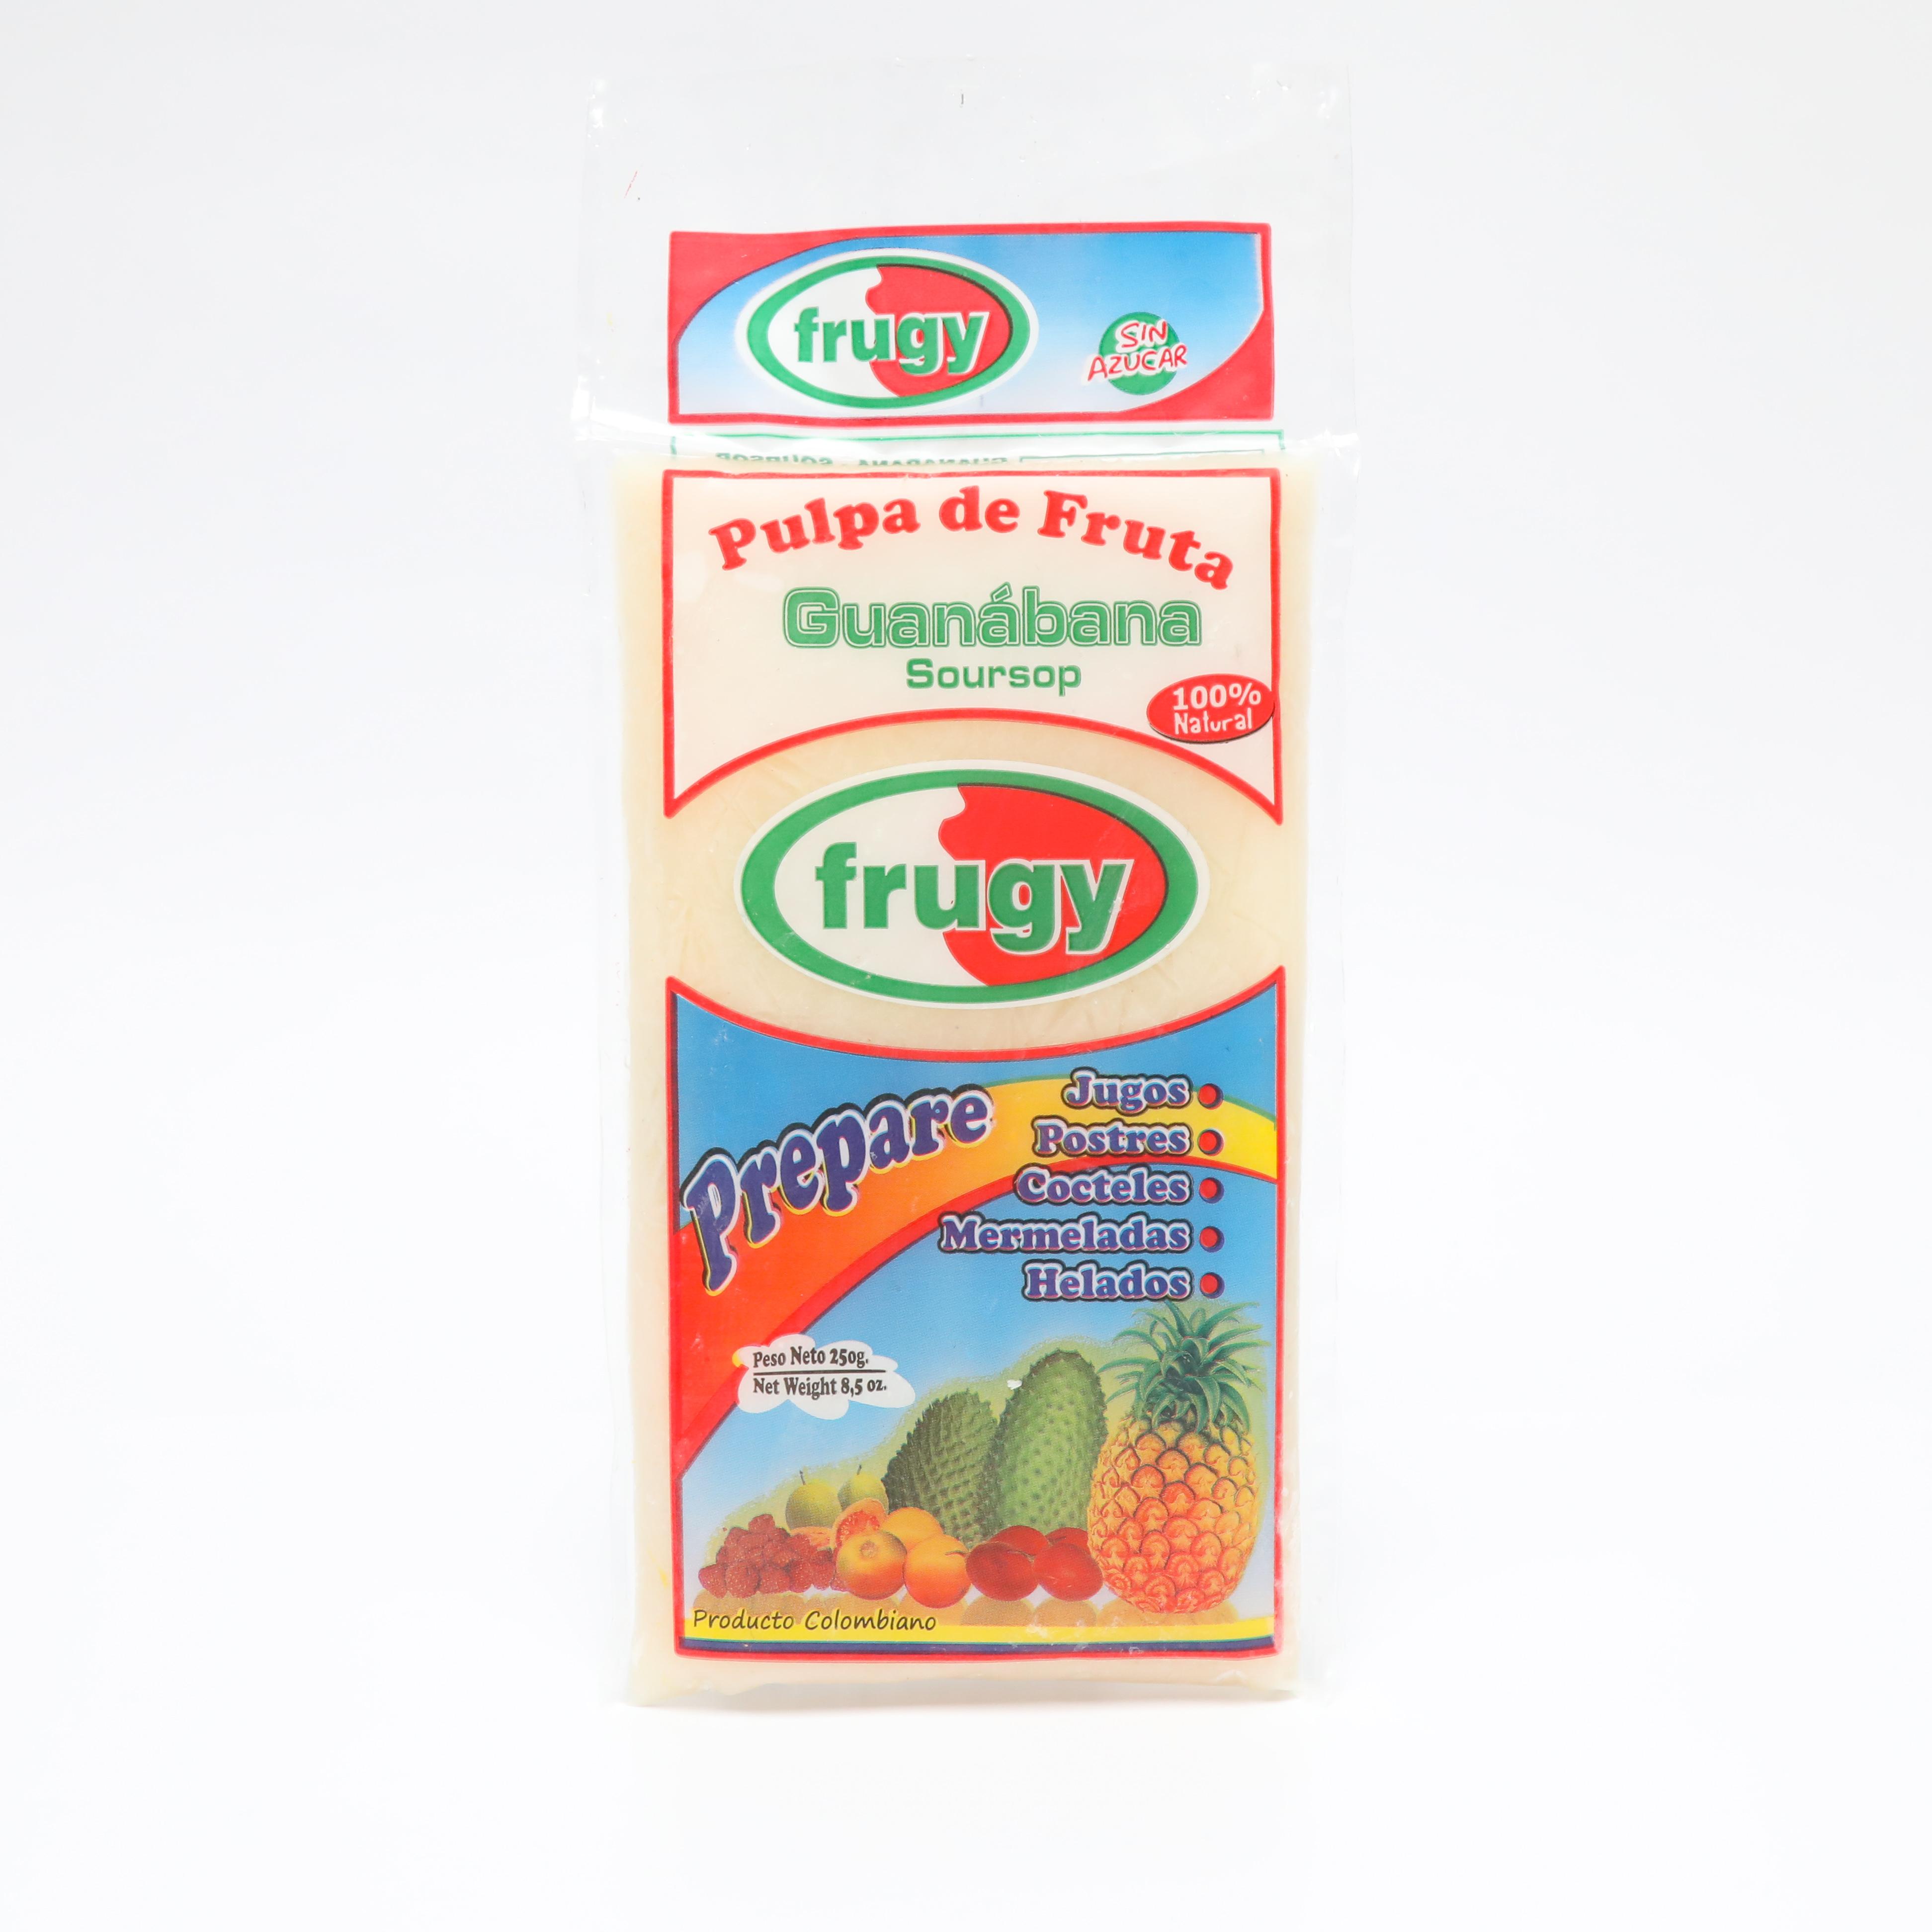 Pulpa Guanábana Frugy 250g x 3 und